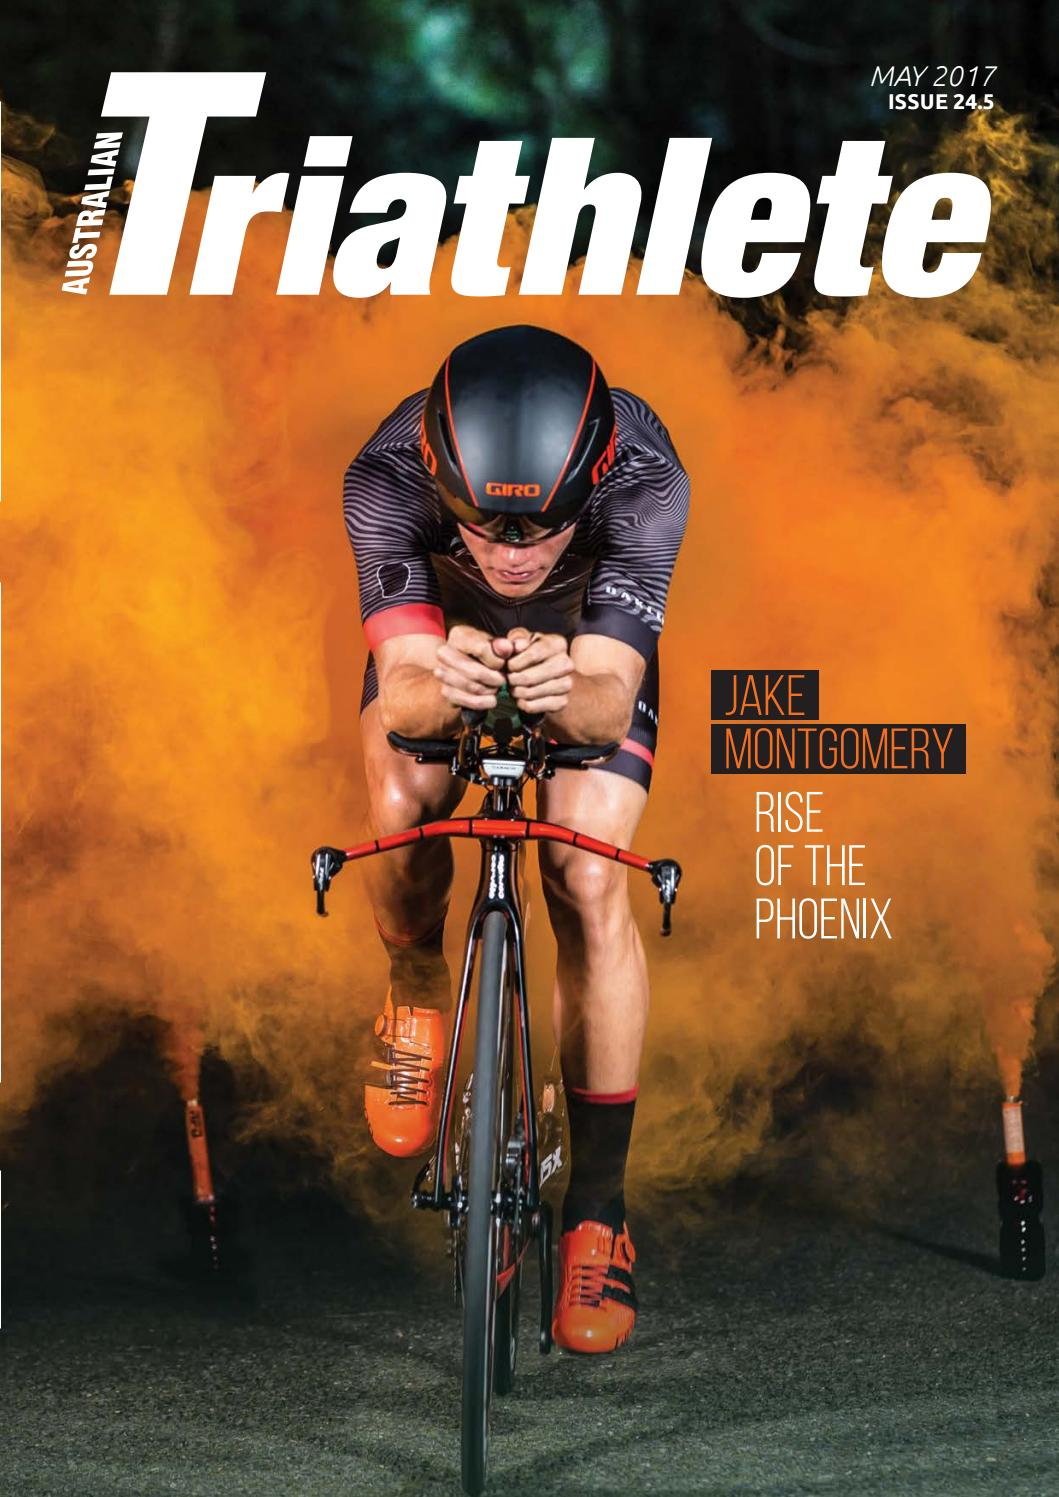 e113d70d Australian Triathlete June/July 2017 by Publicity Press - issuu